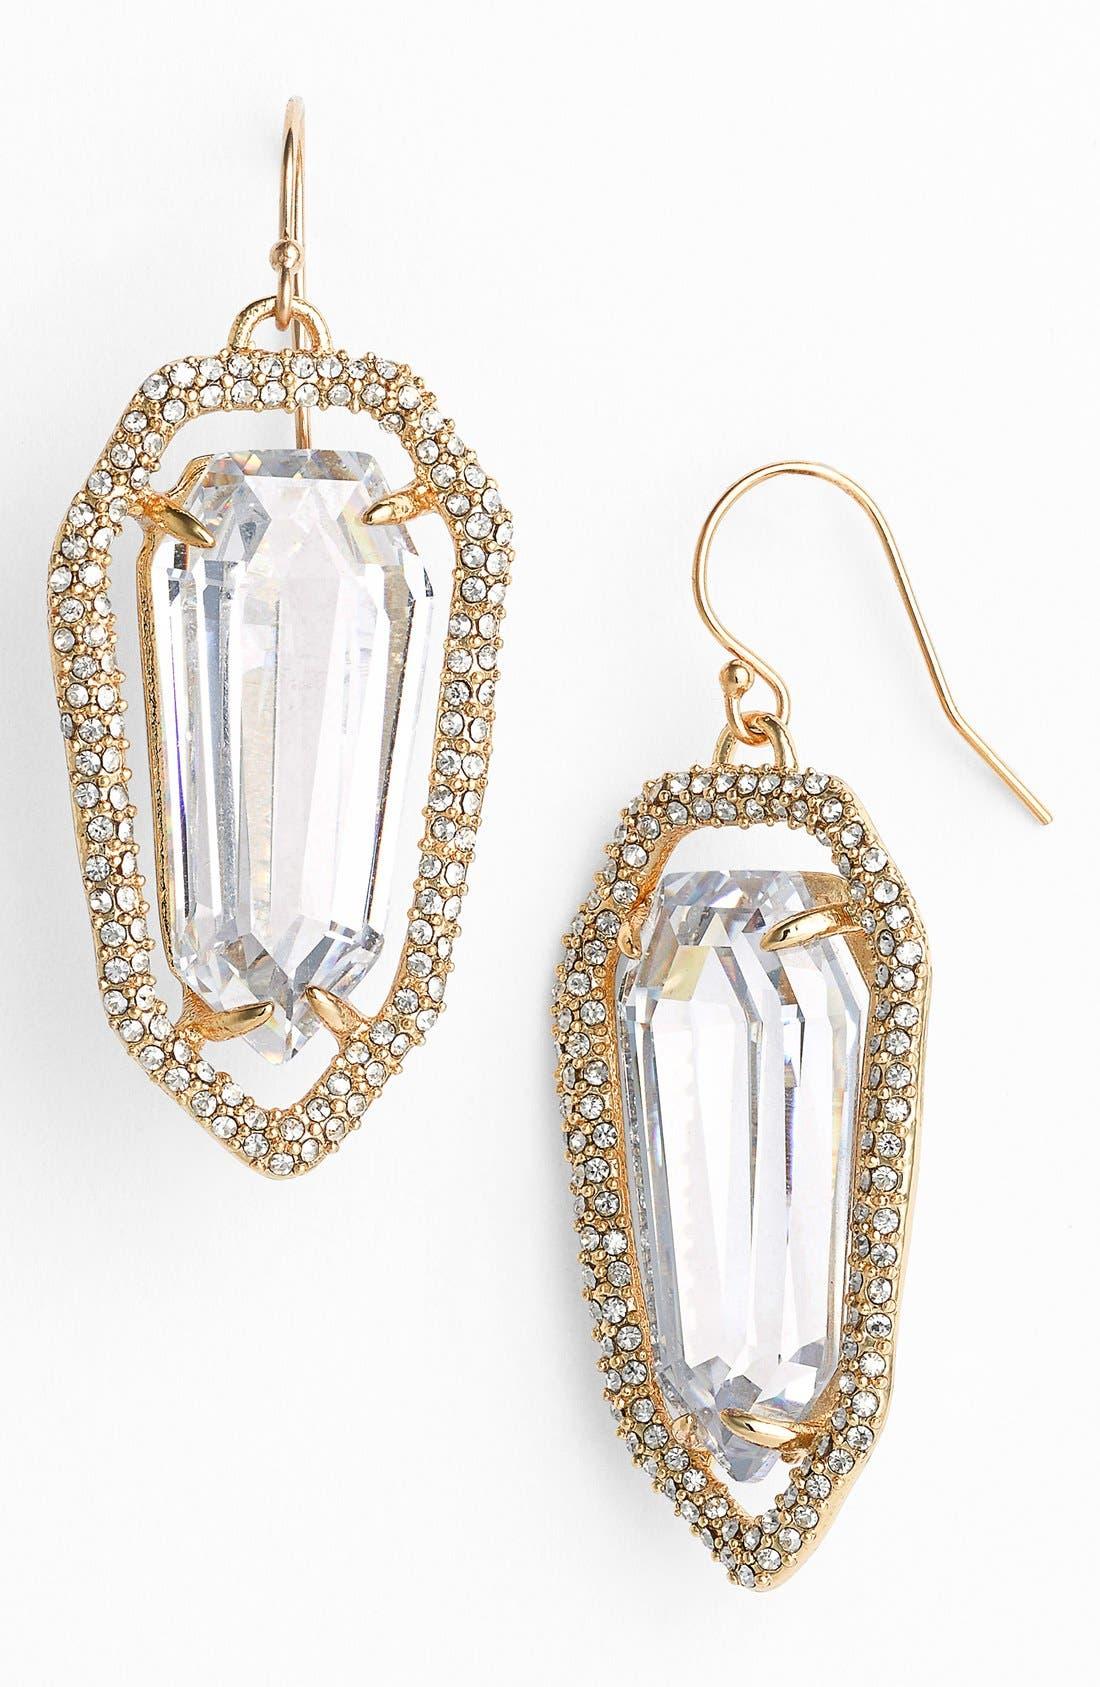 Alternate Image 1 Selected - Alexis Bittar 'Miss Havisham' Crystal Encrusted Shield Earrings